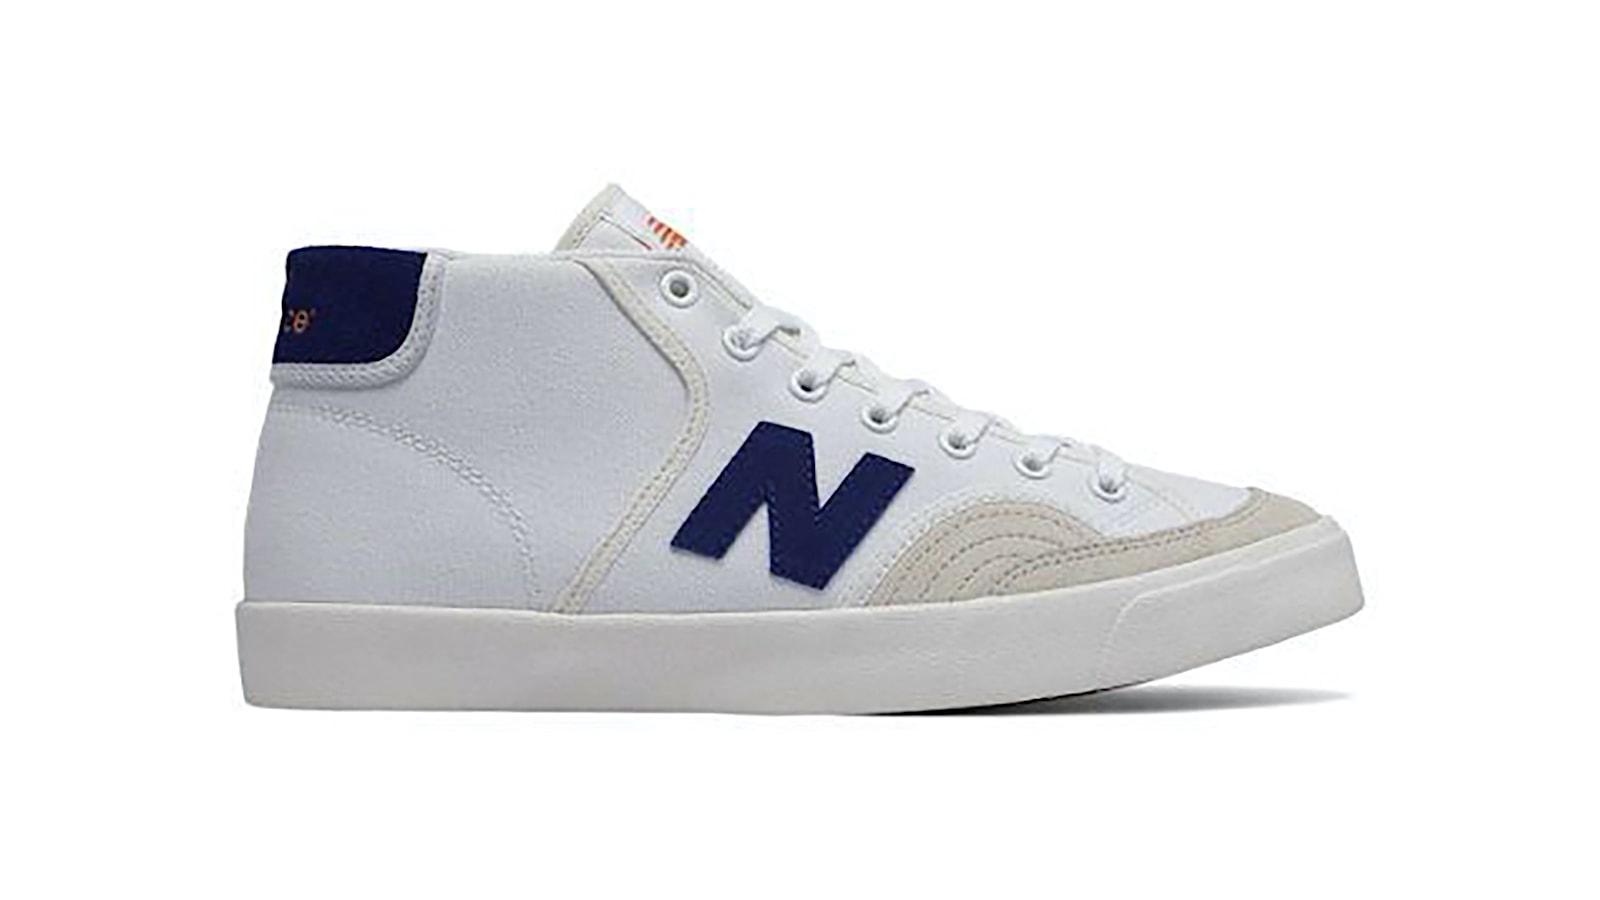 6ix9ine 在出狱后的首支 MV 中穿了什么鞋?| 五月 MV 球鞋大赏